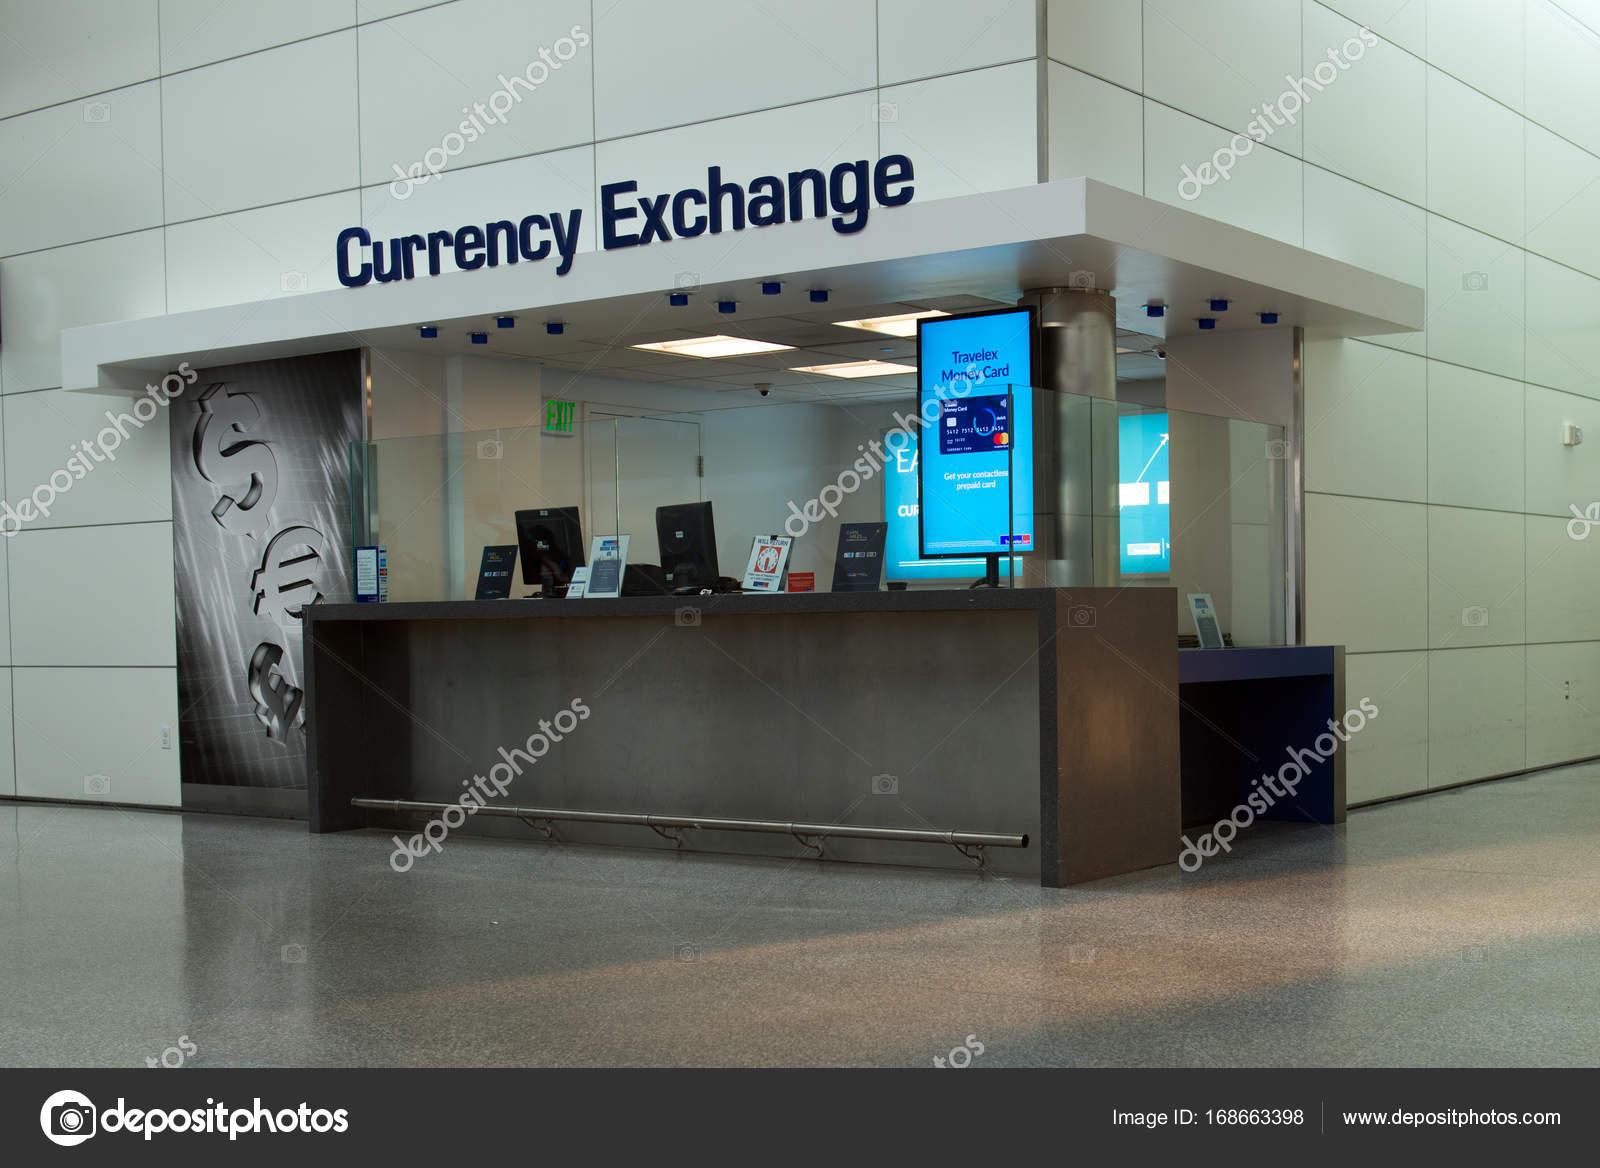 Forex exchange bangalore airport